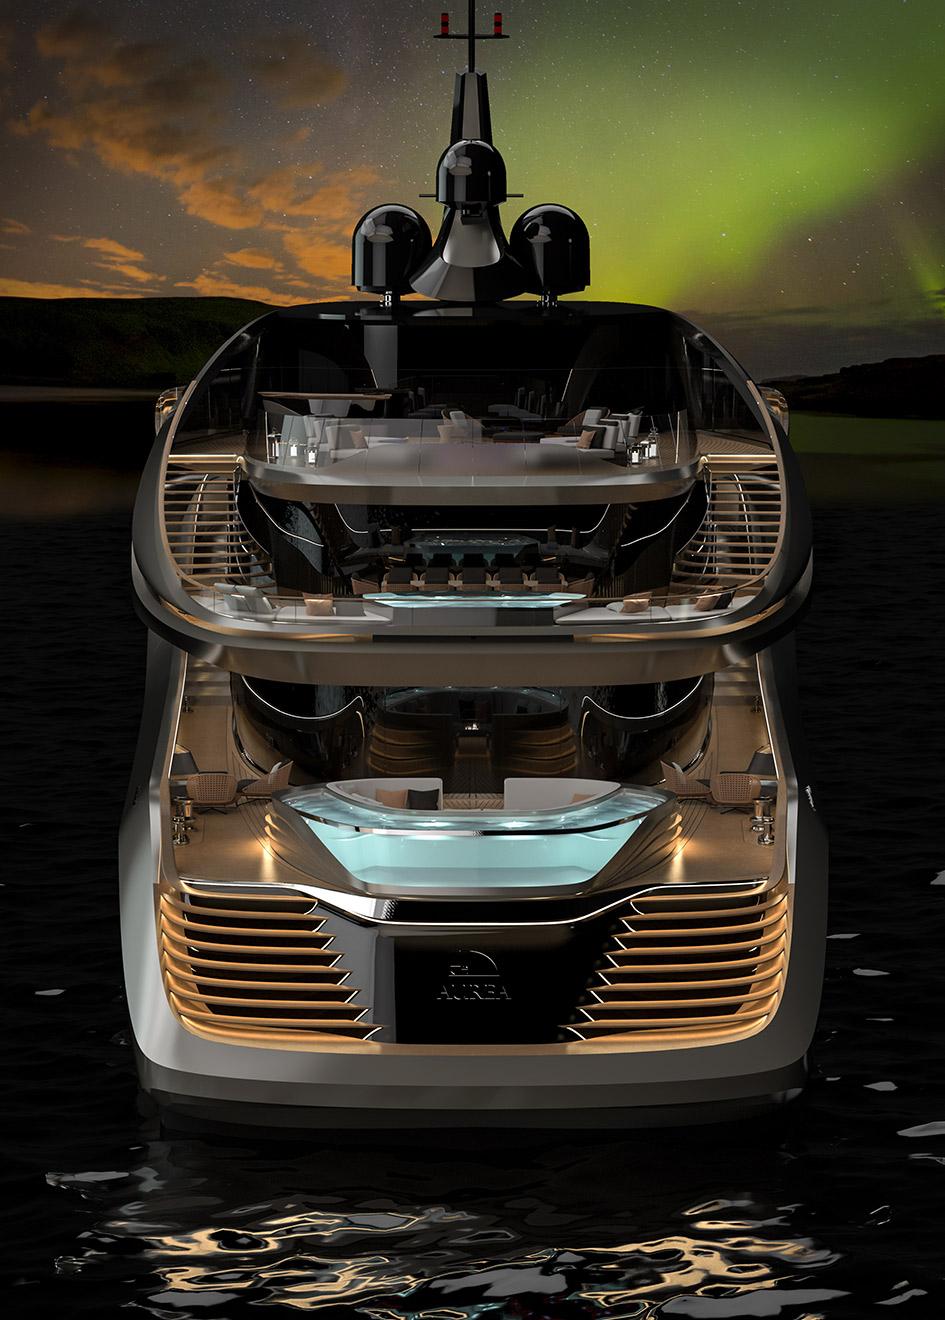 aft-view-of-the-rossinavi-pininfarina-superyacht-concept-aurea